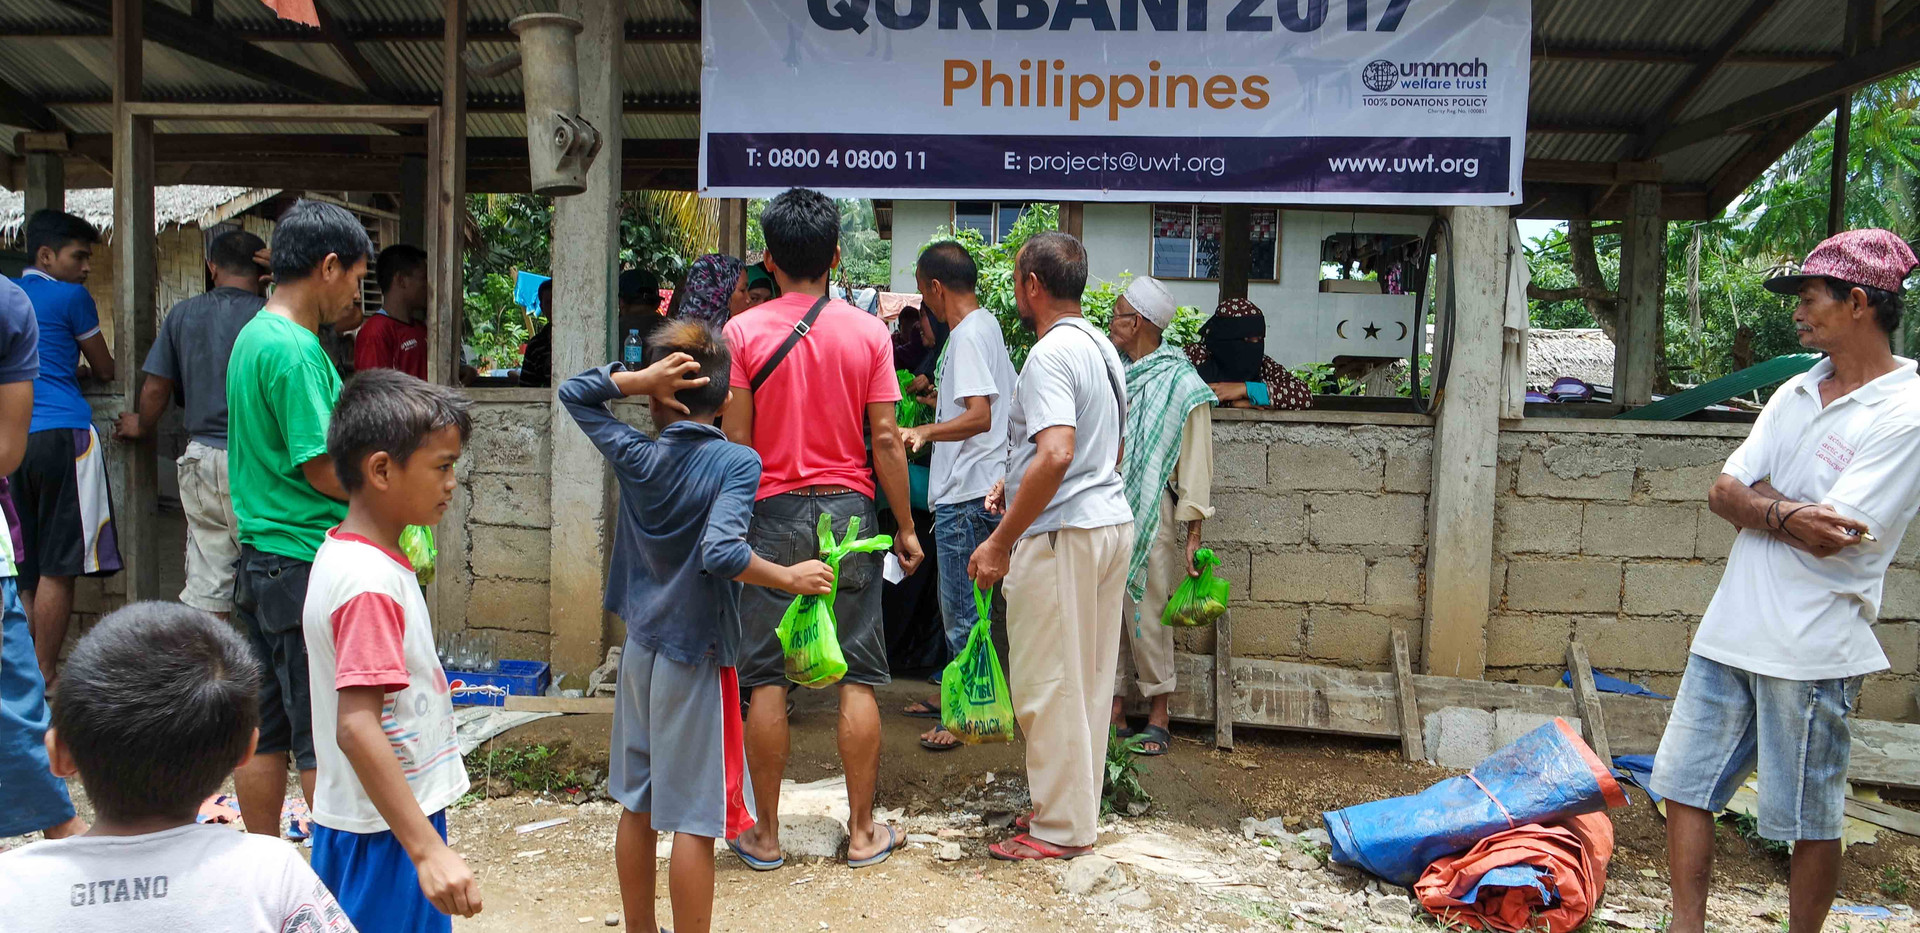 Qurban in Phillipines 2017